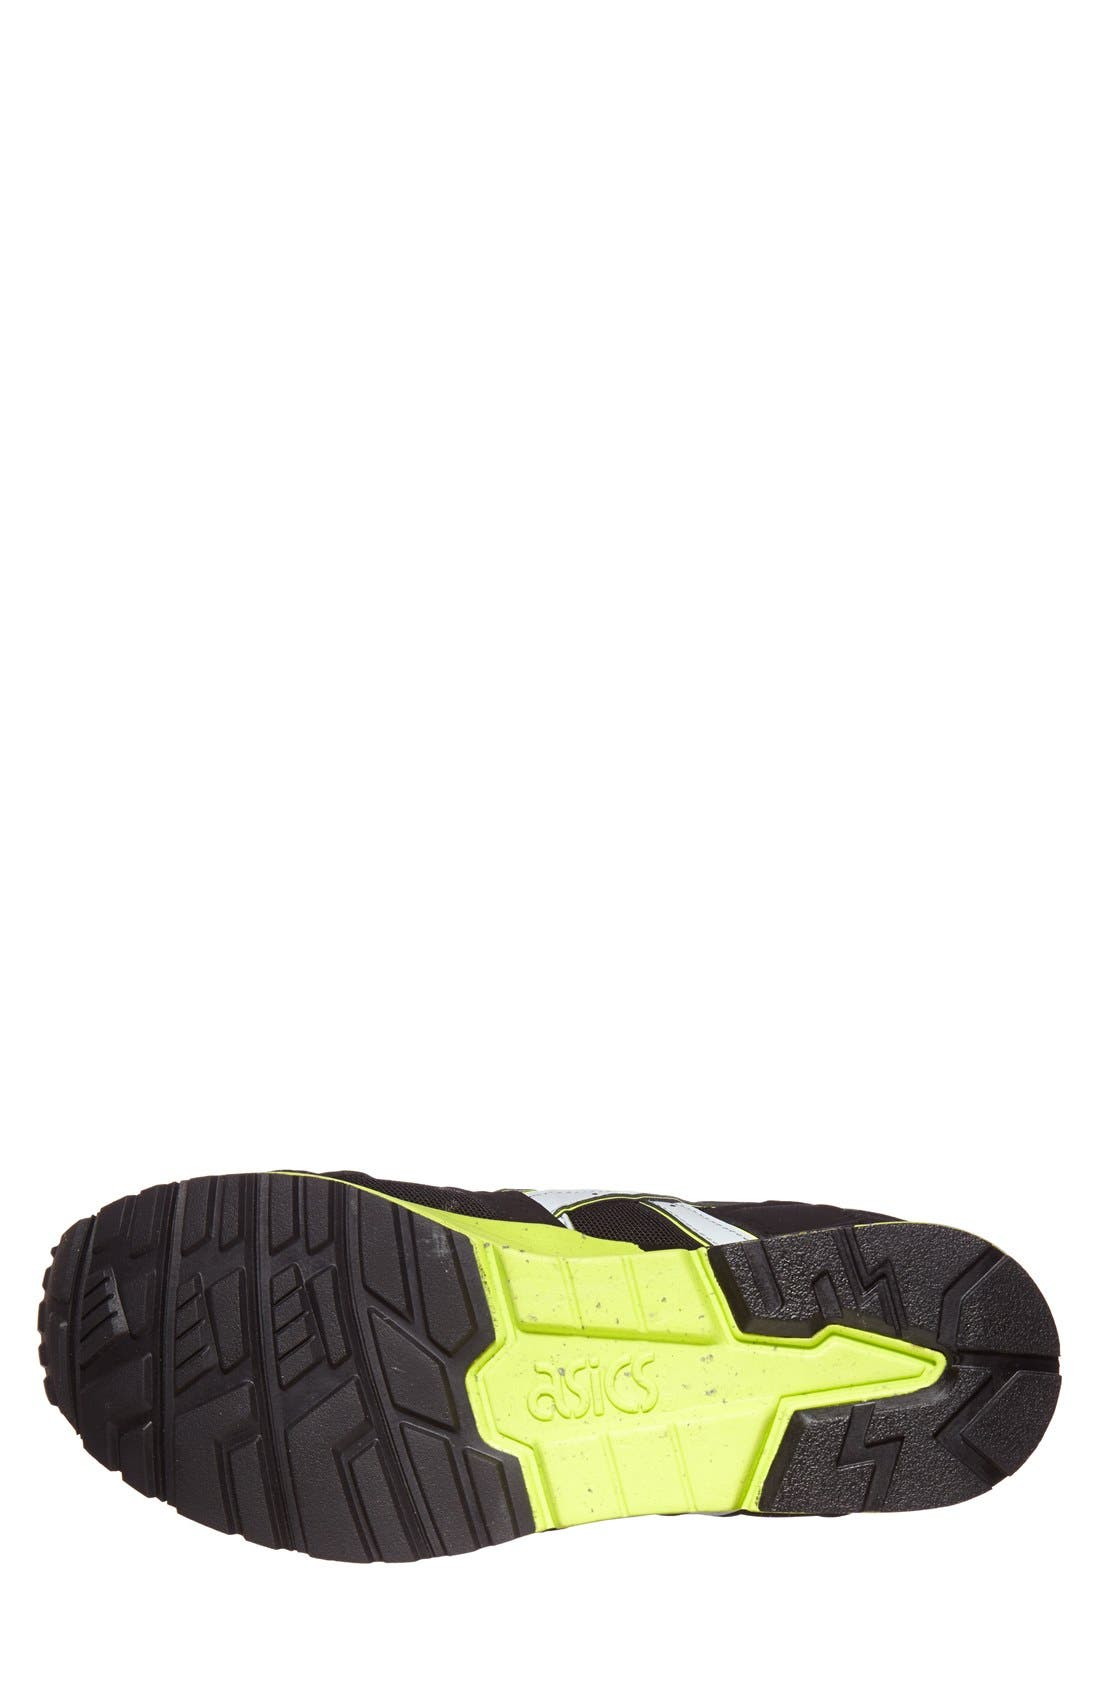 'GEL-Lyte V' Gore-Tex<sup>®</sup> Sneaker,                             Alternate thumbnail 3, color,                             004